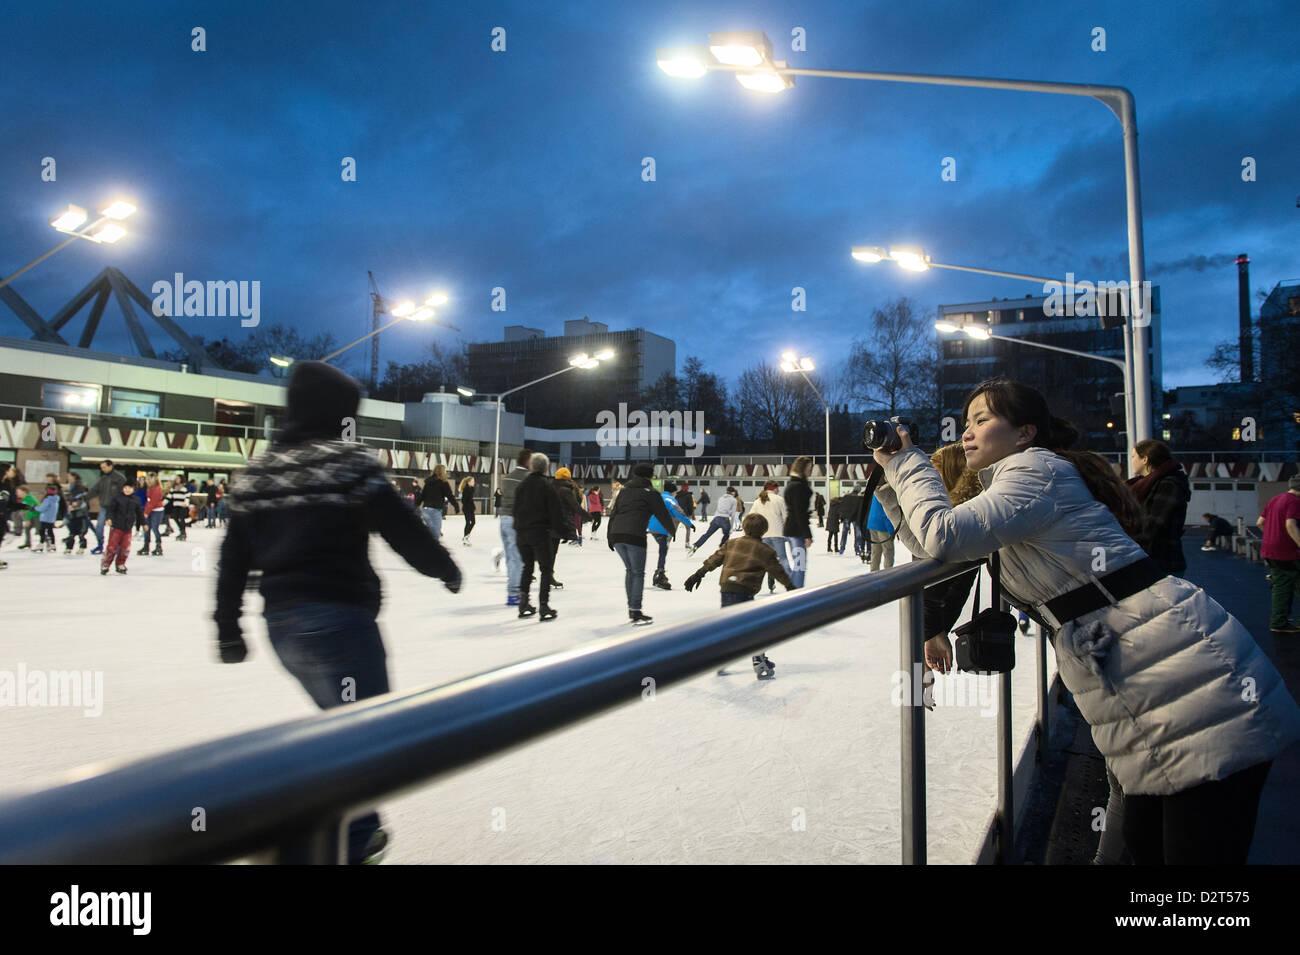 Berlin, Germany, ice skating rink in the Erika Hess Wedding - Stock Image